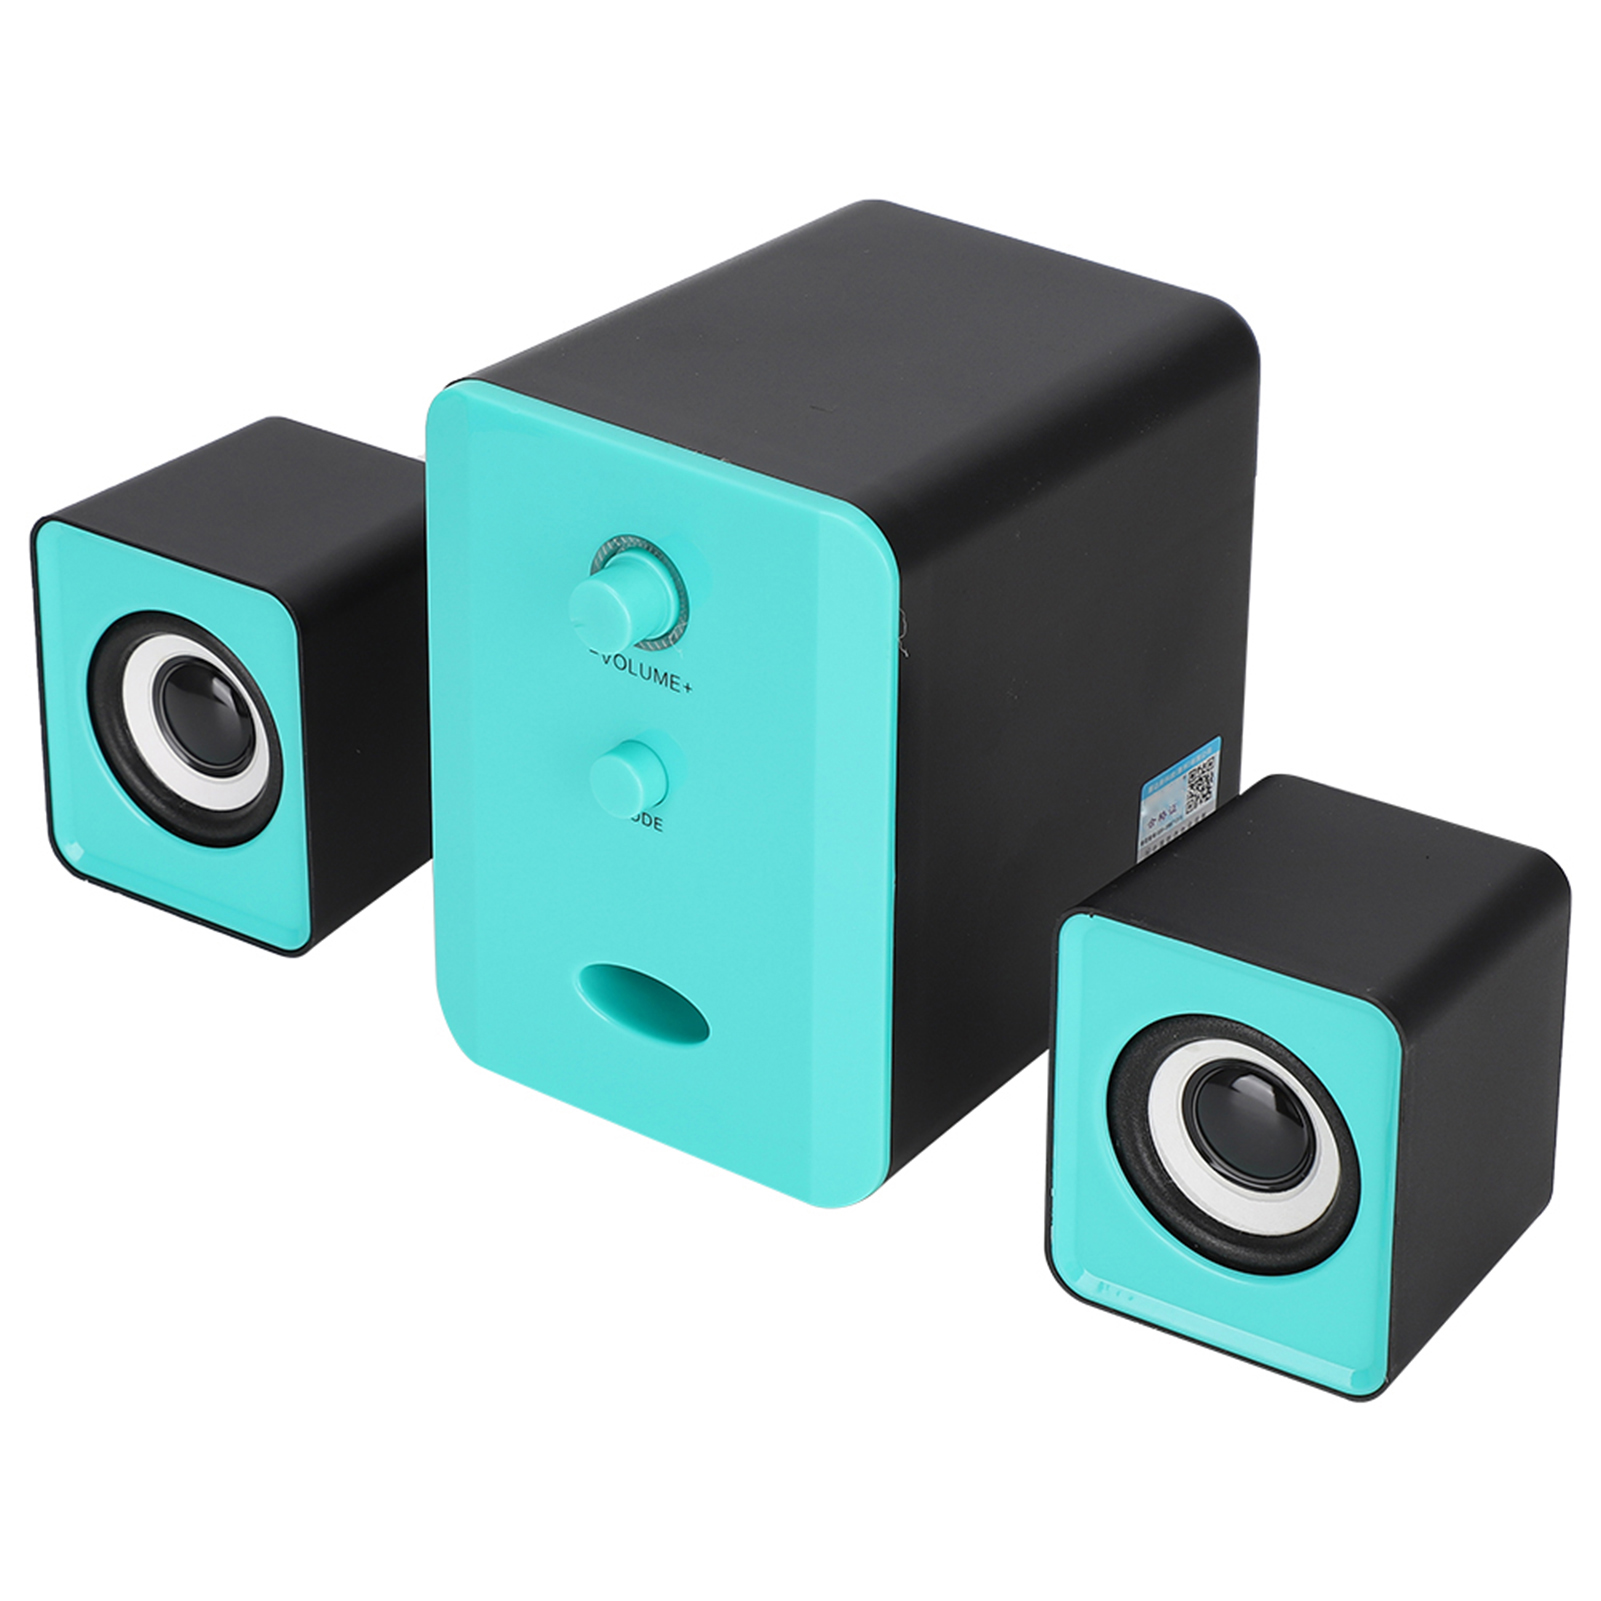 SADA-Bluetooth-Computer-Speaker-Desktop-Laptop-PC-Stereo-Subwoofer-Multimedia thumbnail 92